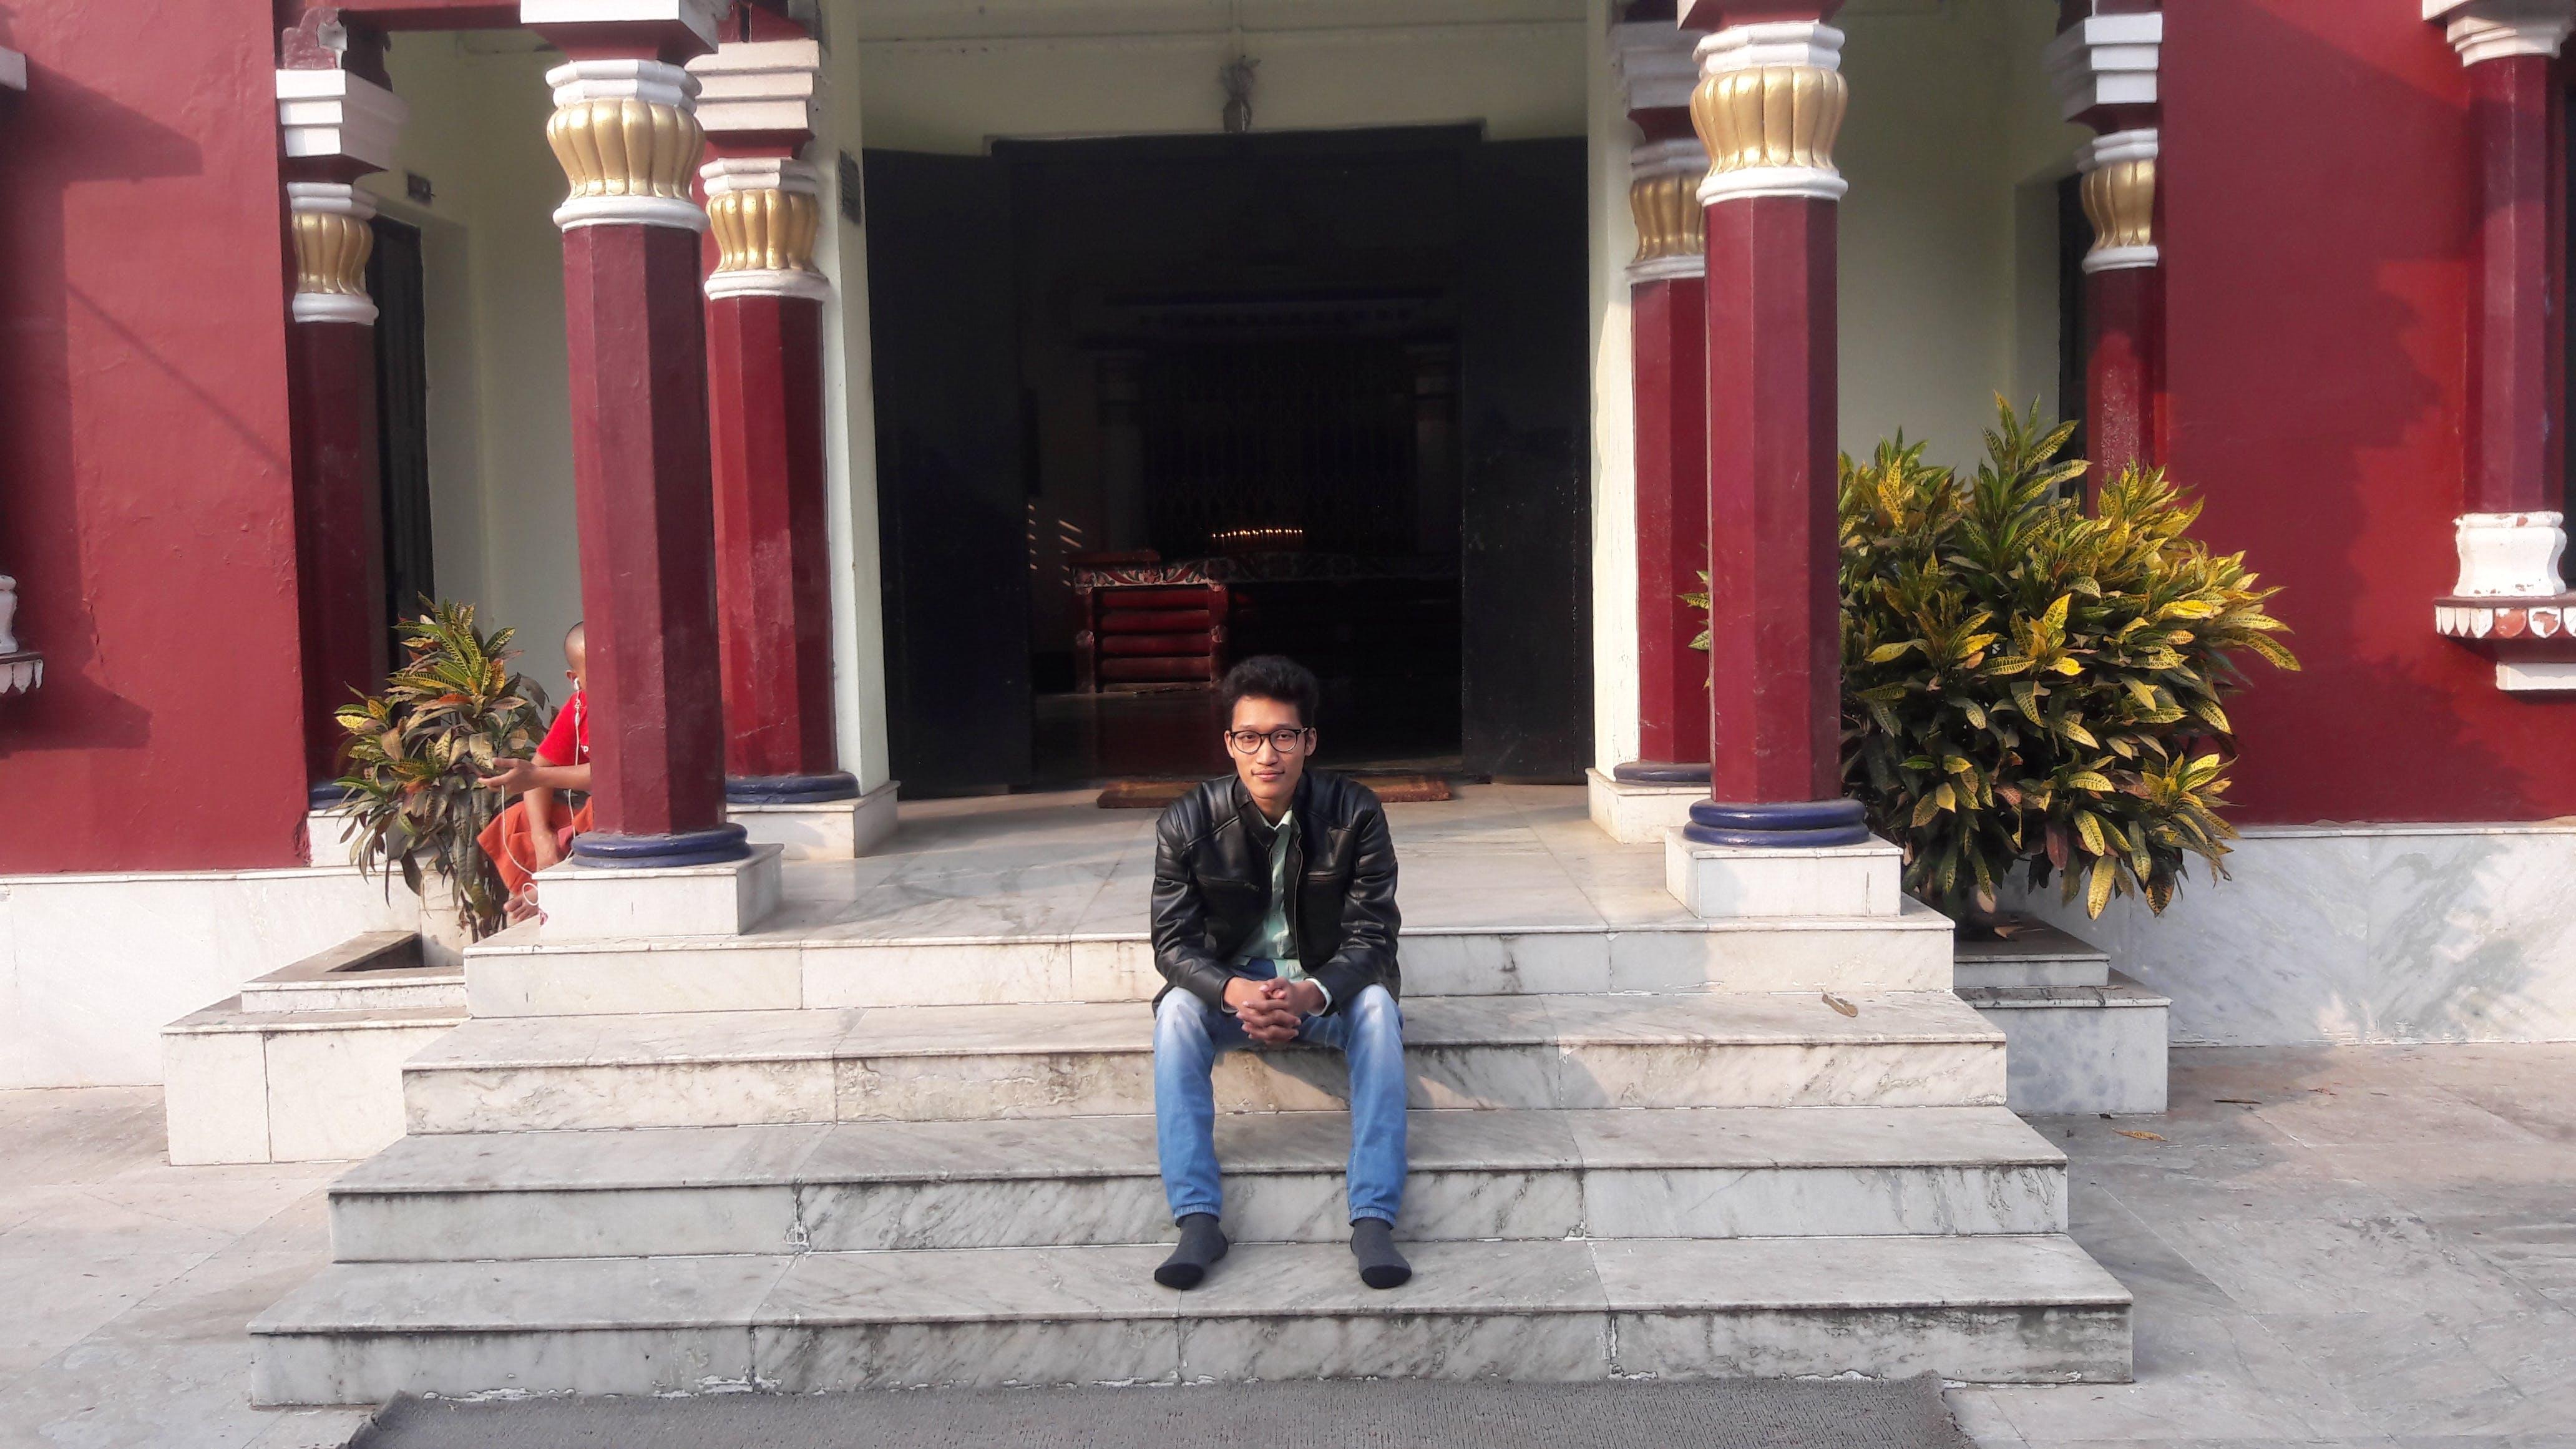 Man Sitting on Staircase Beside Red Pillars